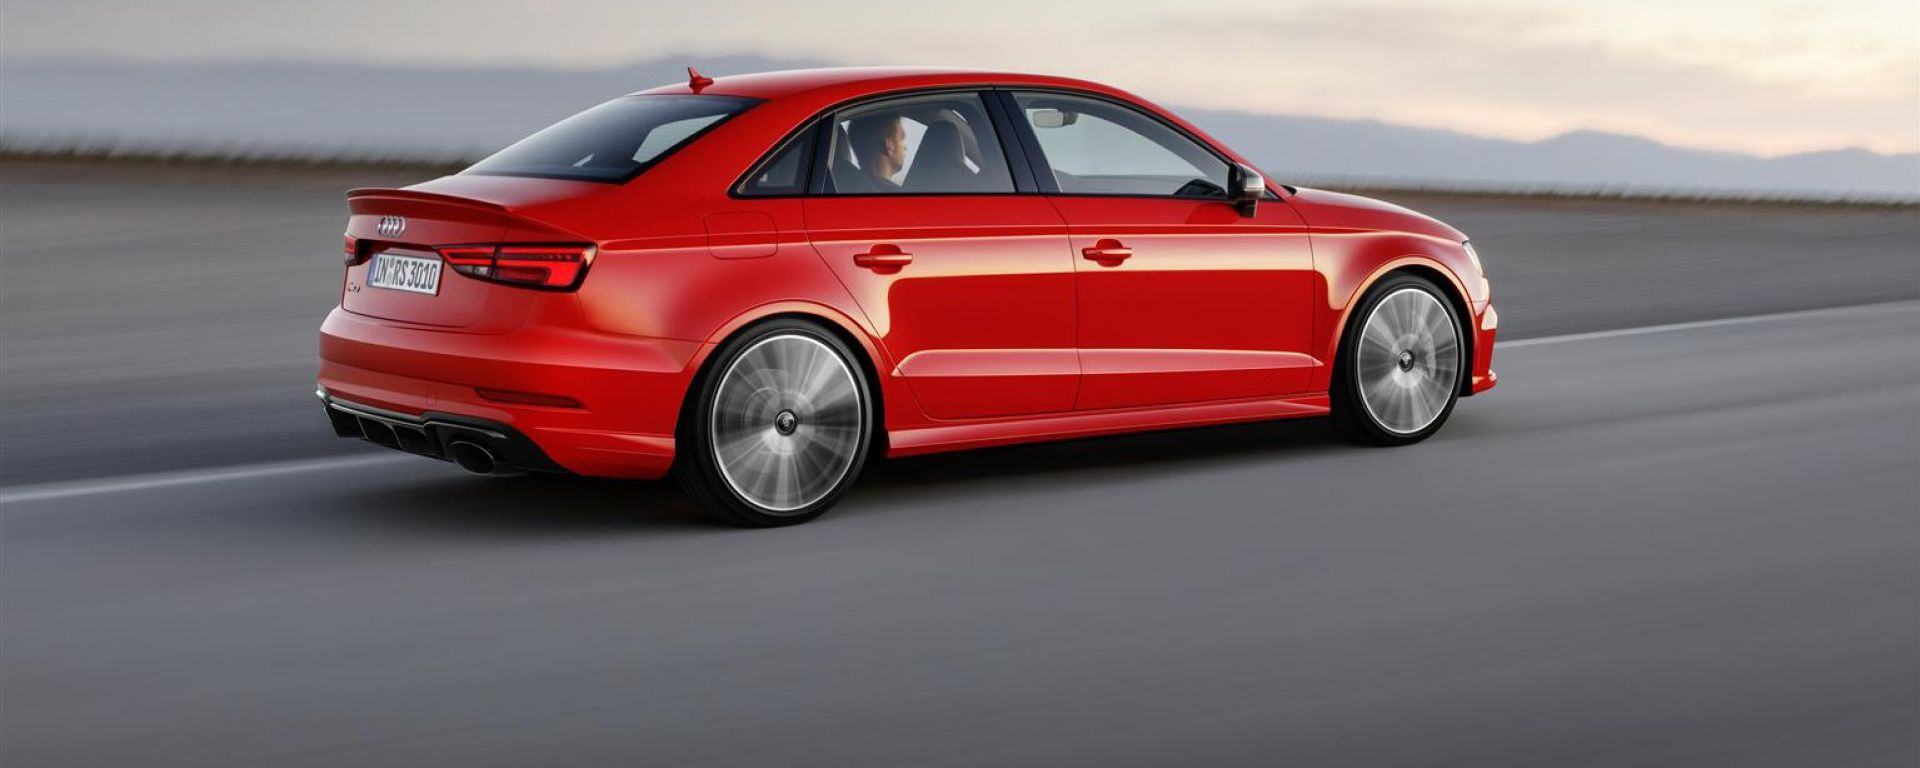 La Audi RS 3 Sedan debutta al Salone di Parigi 2016